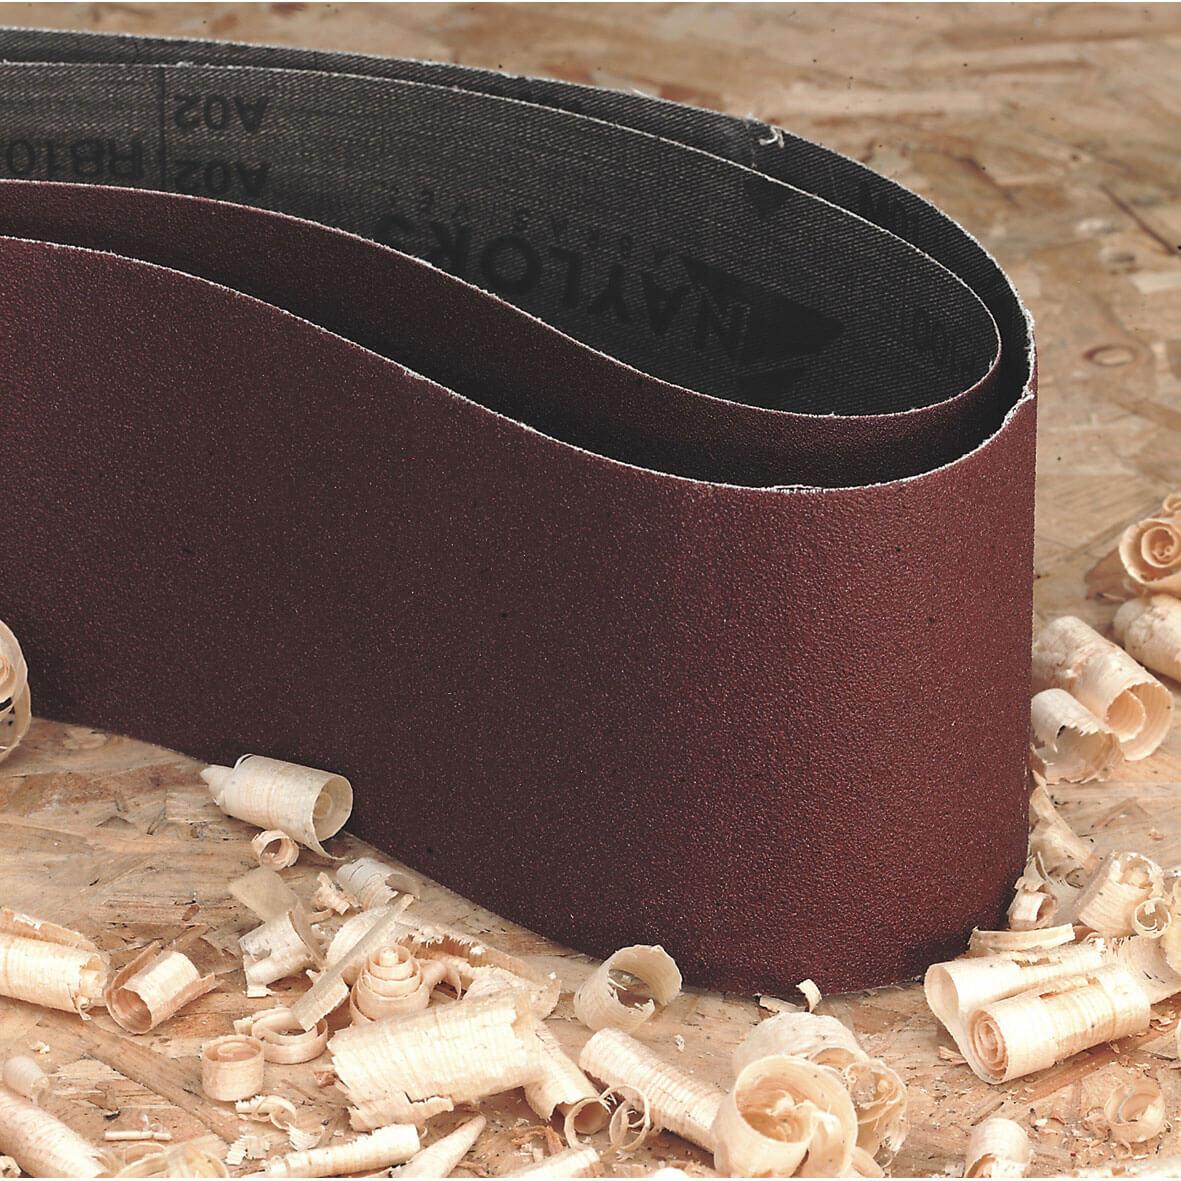 Image of Sealey 150mm x 1220mm Sanding Belt 150mm x 1220mm 80g Pack of 1